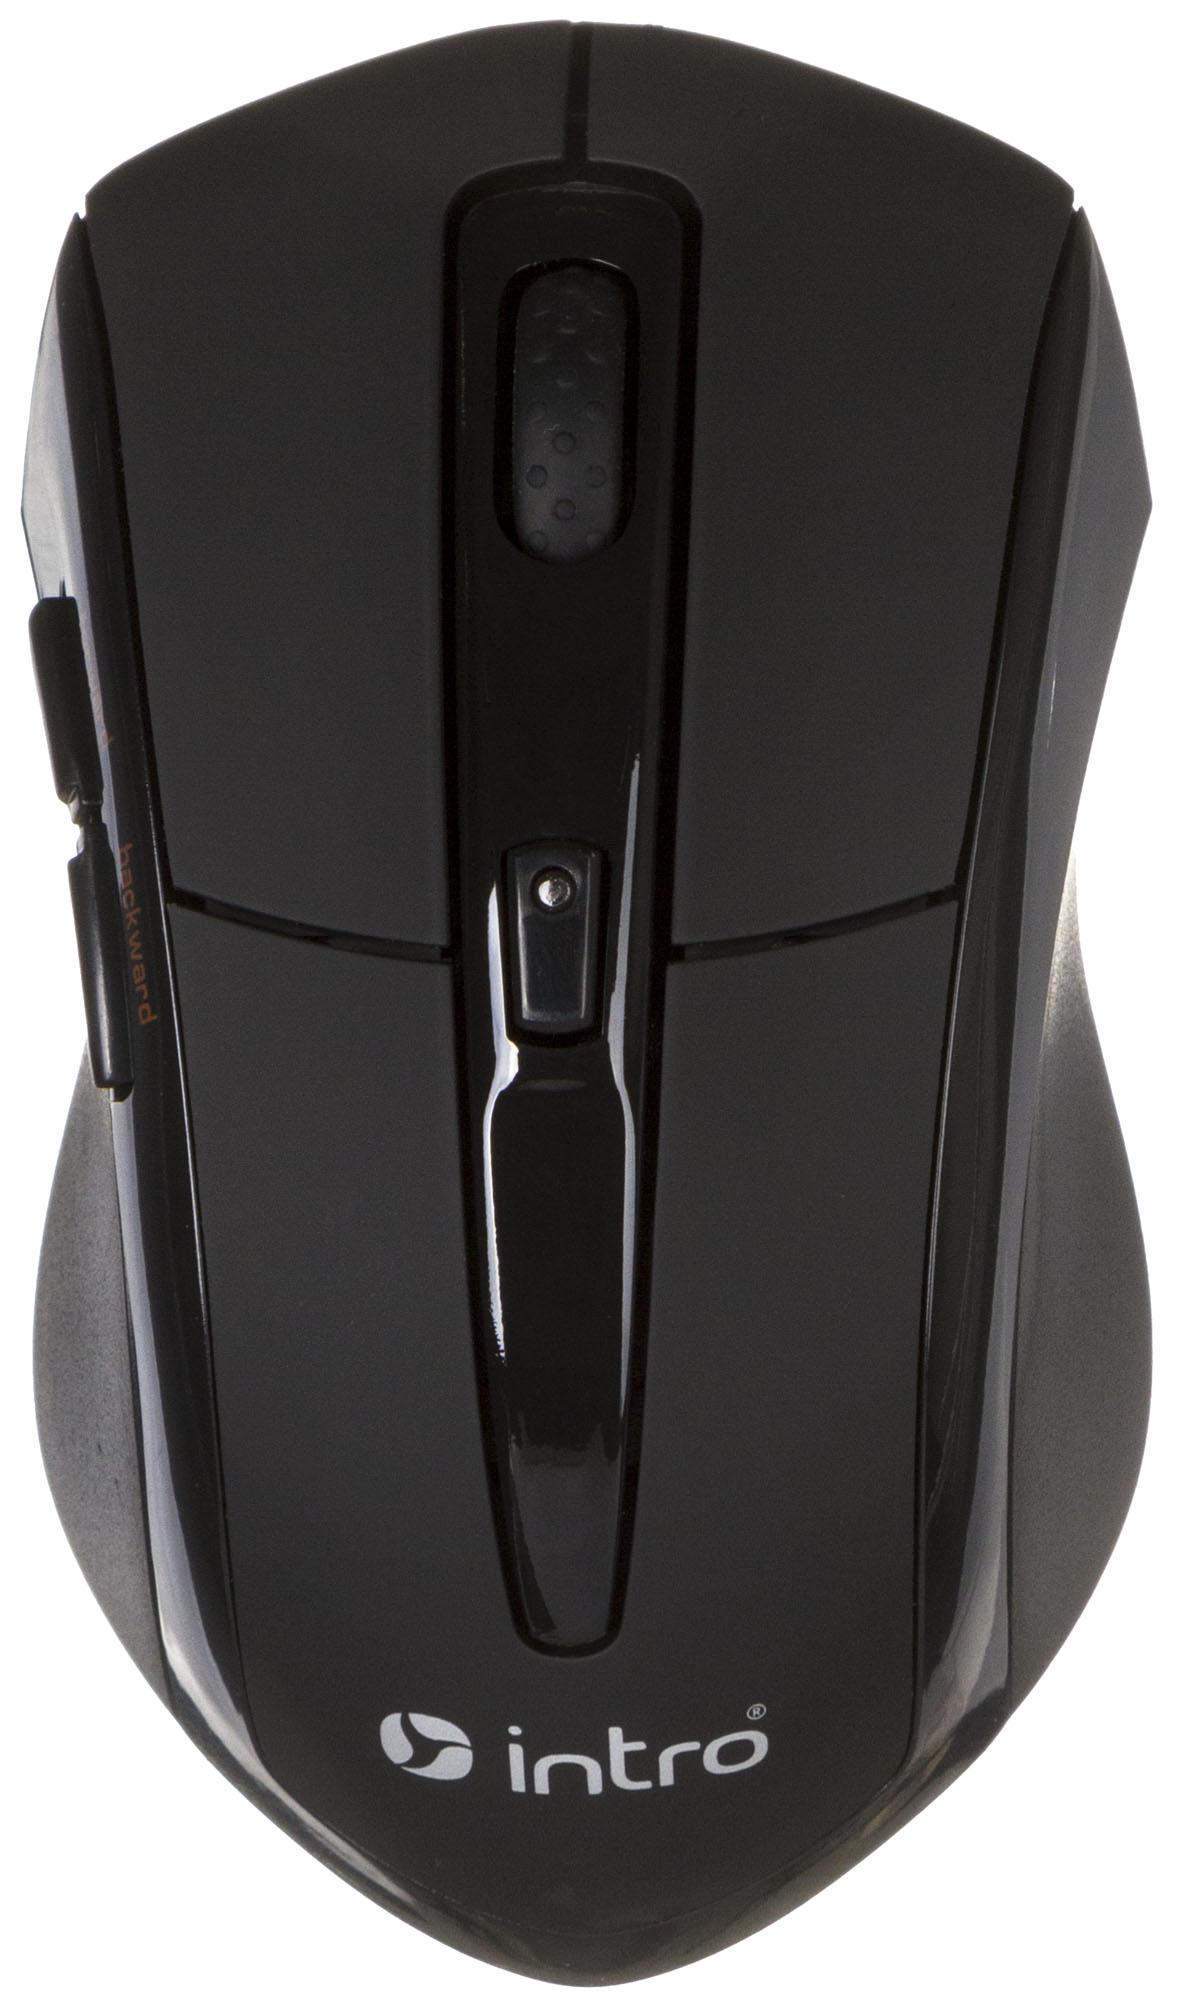 Компьютерная мышь Intro MW207 mouse Wireless Black USB